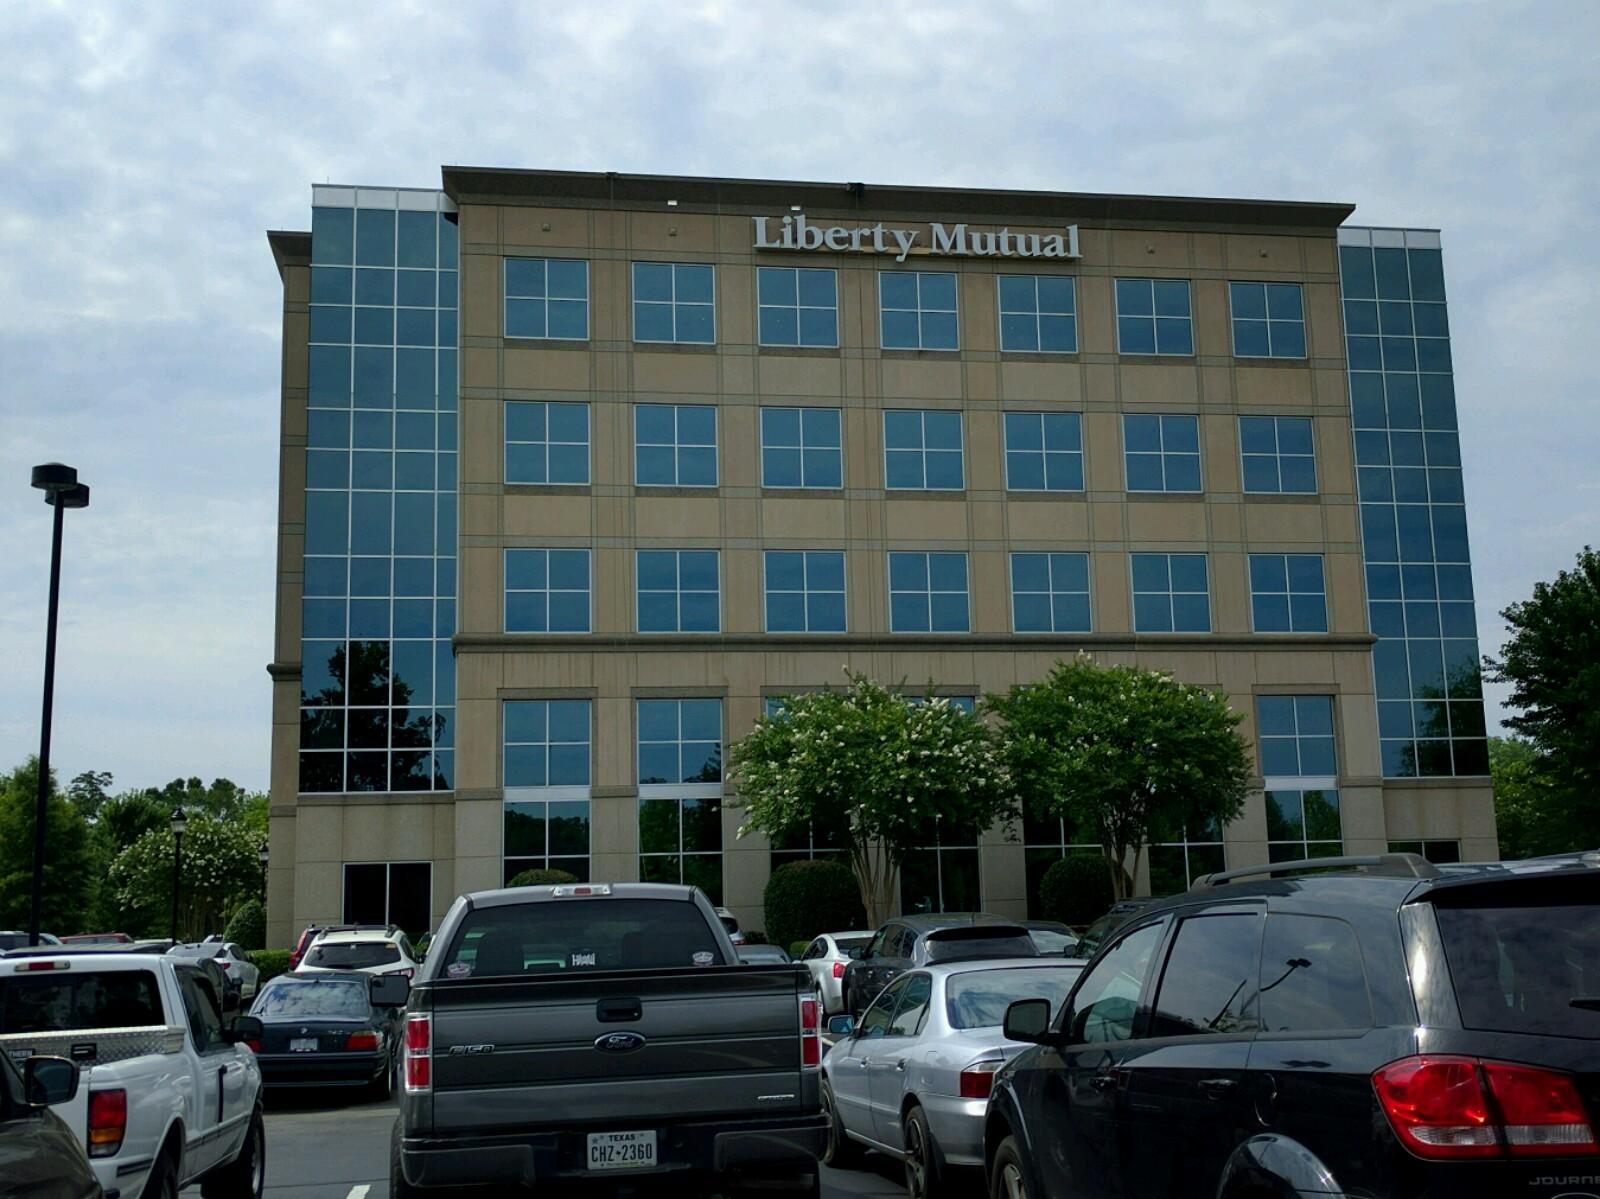 Liberty Mutual office in Charlotte, North Carolina.